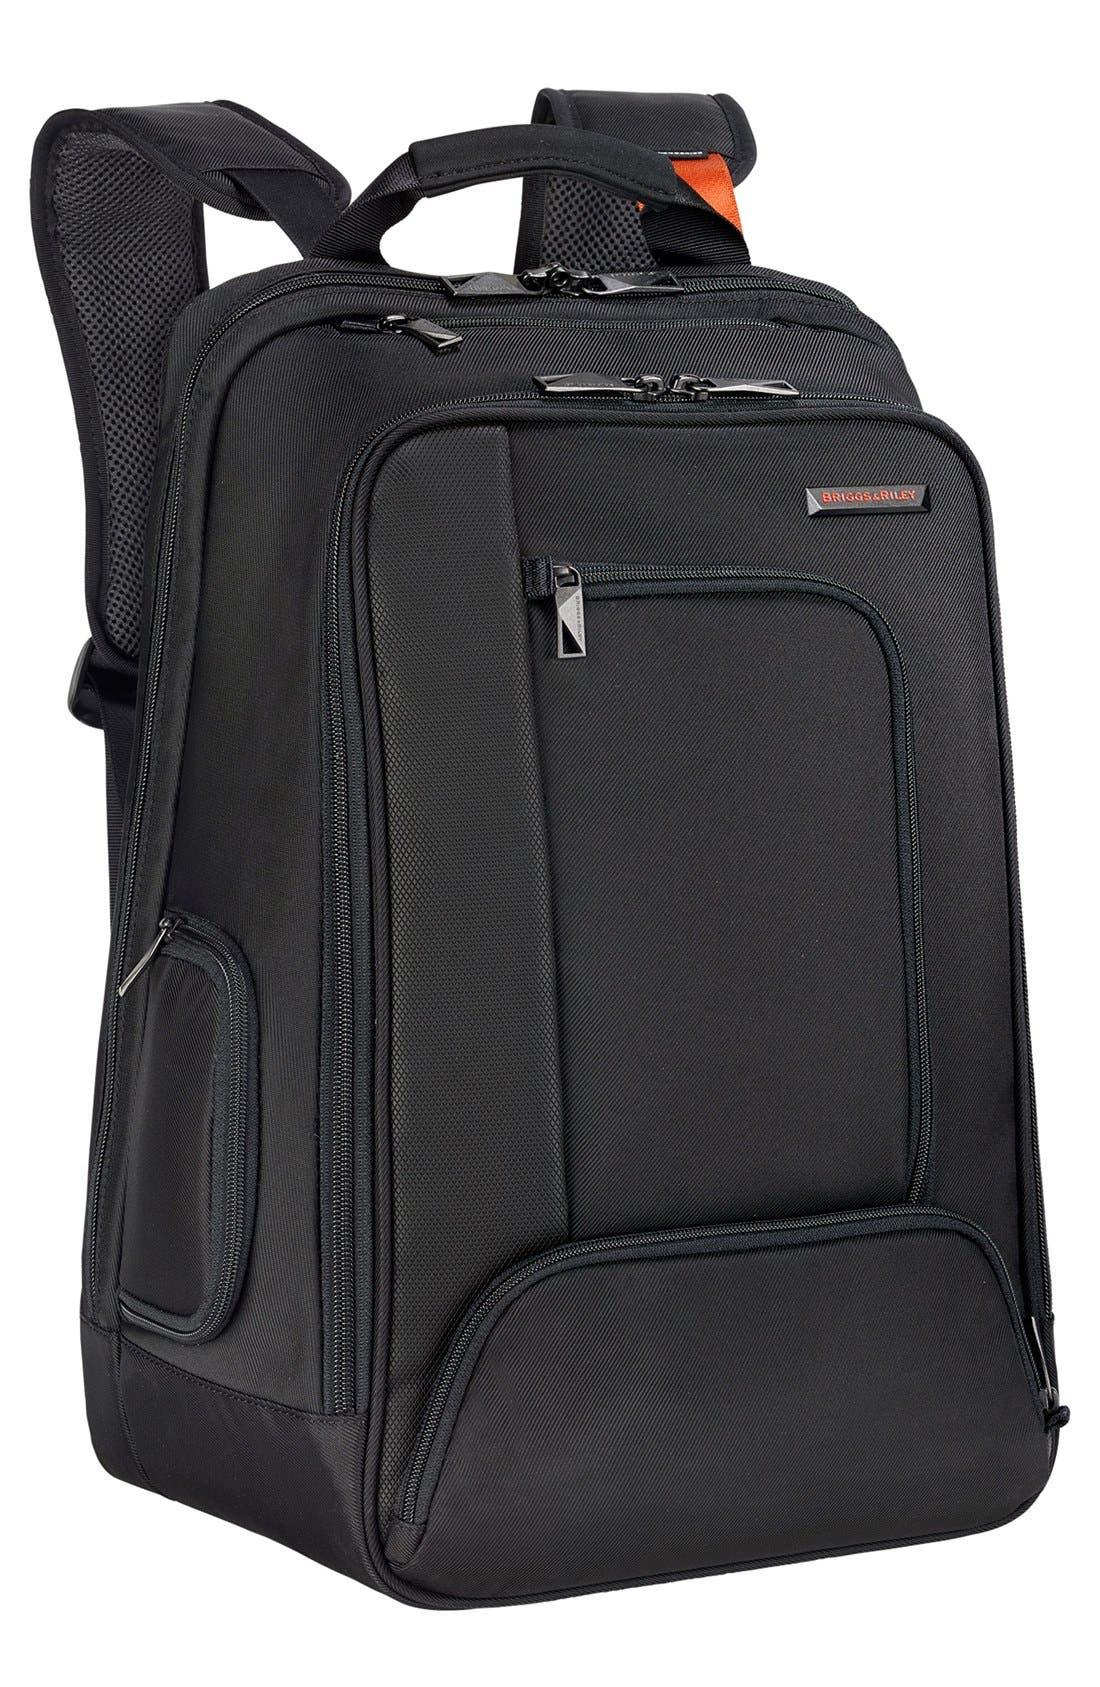 Briggs & Riley 'Verb - Accelerate' Backpack